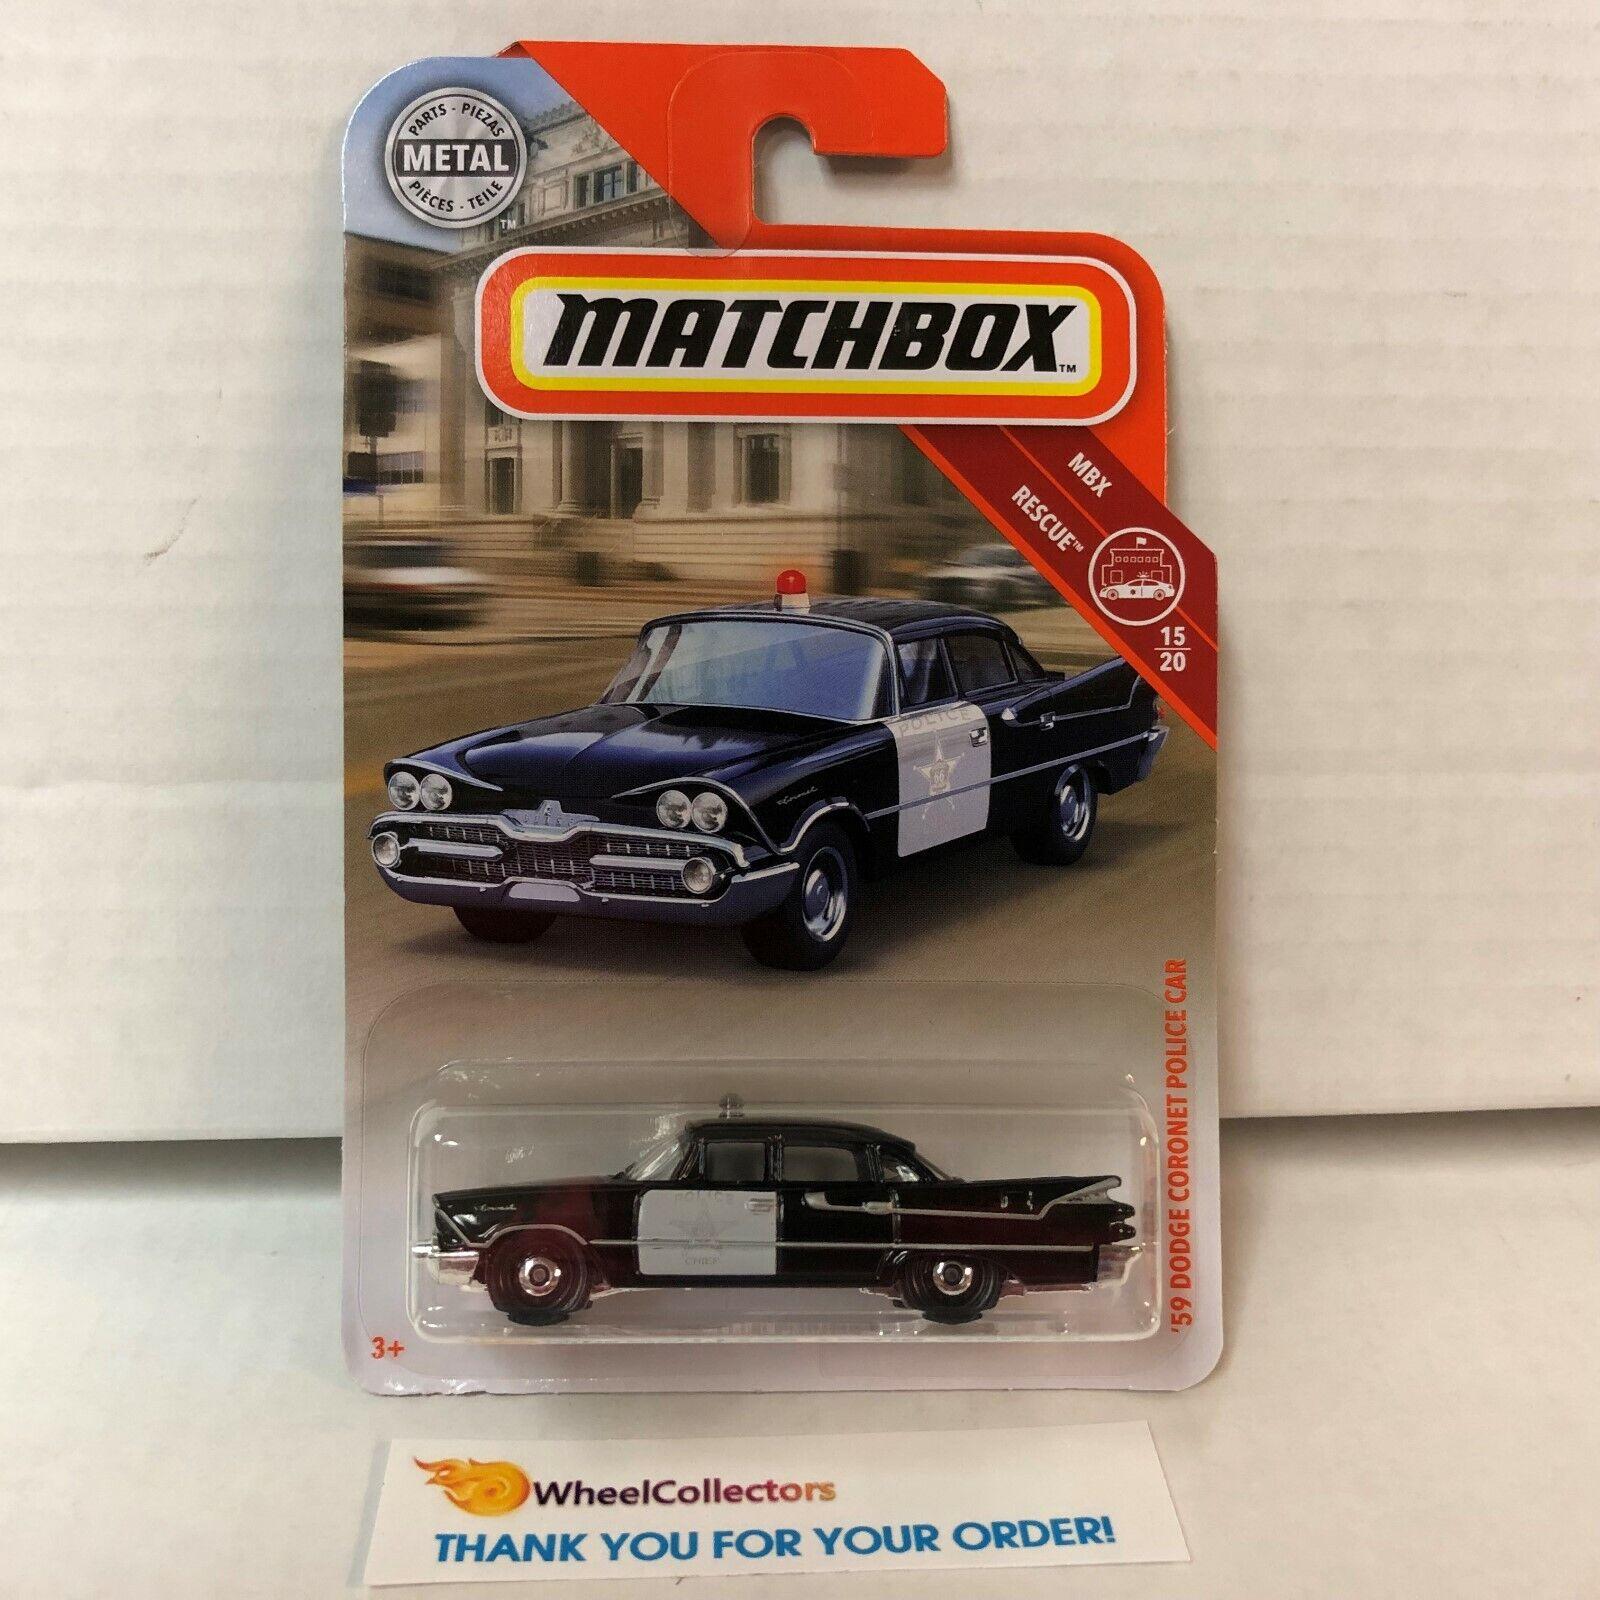 /'59 Dodge Coronet Police Car E43 2019 Matchbox Case N Black